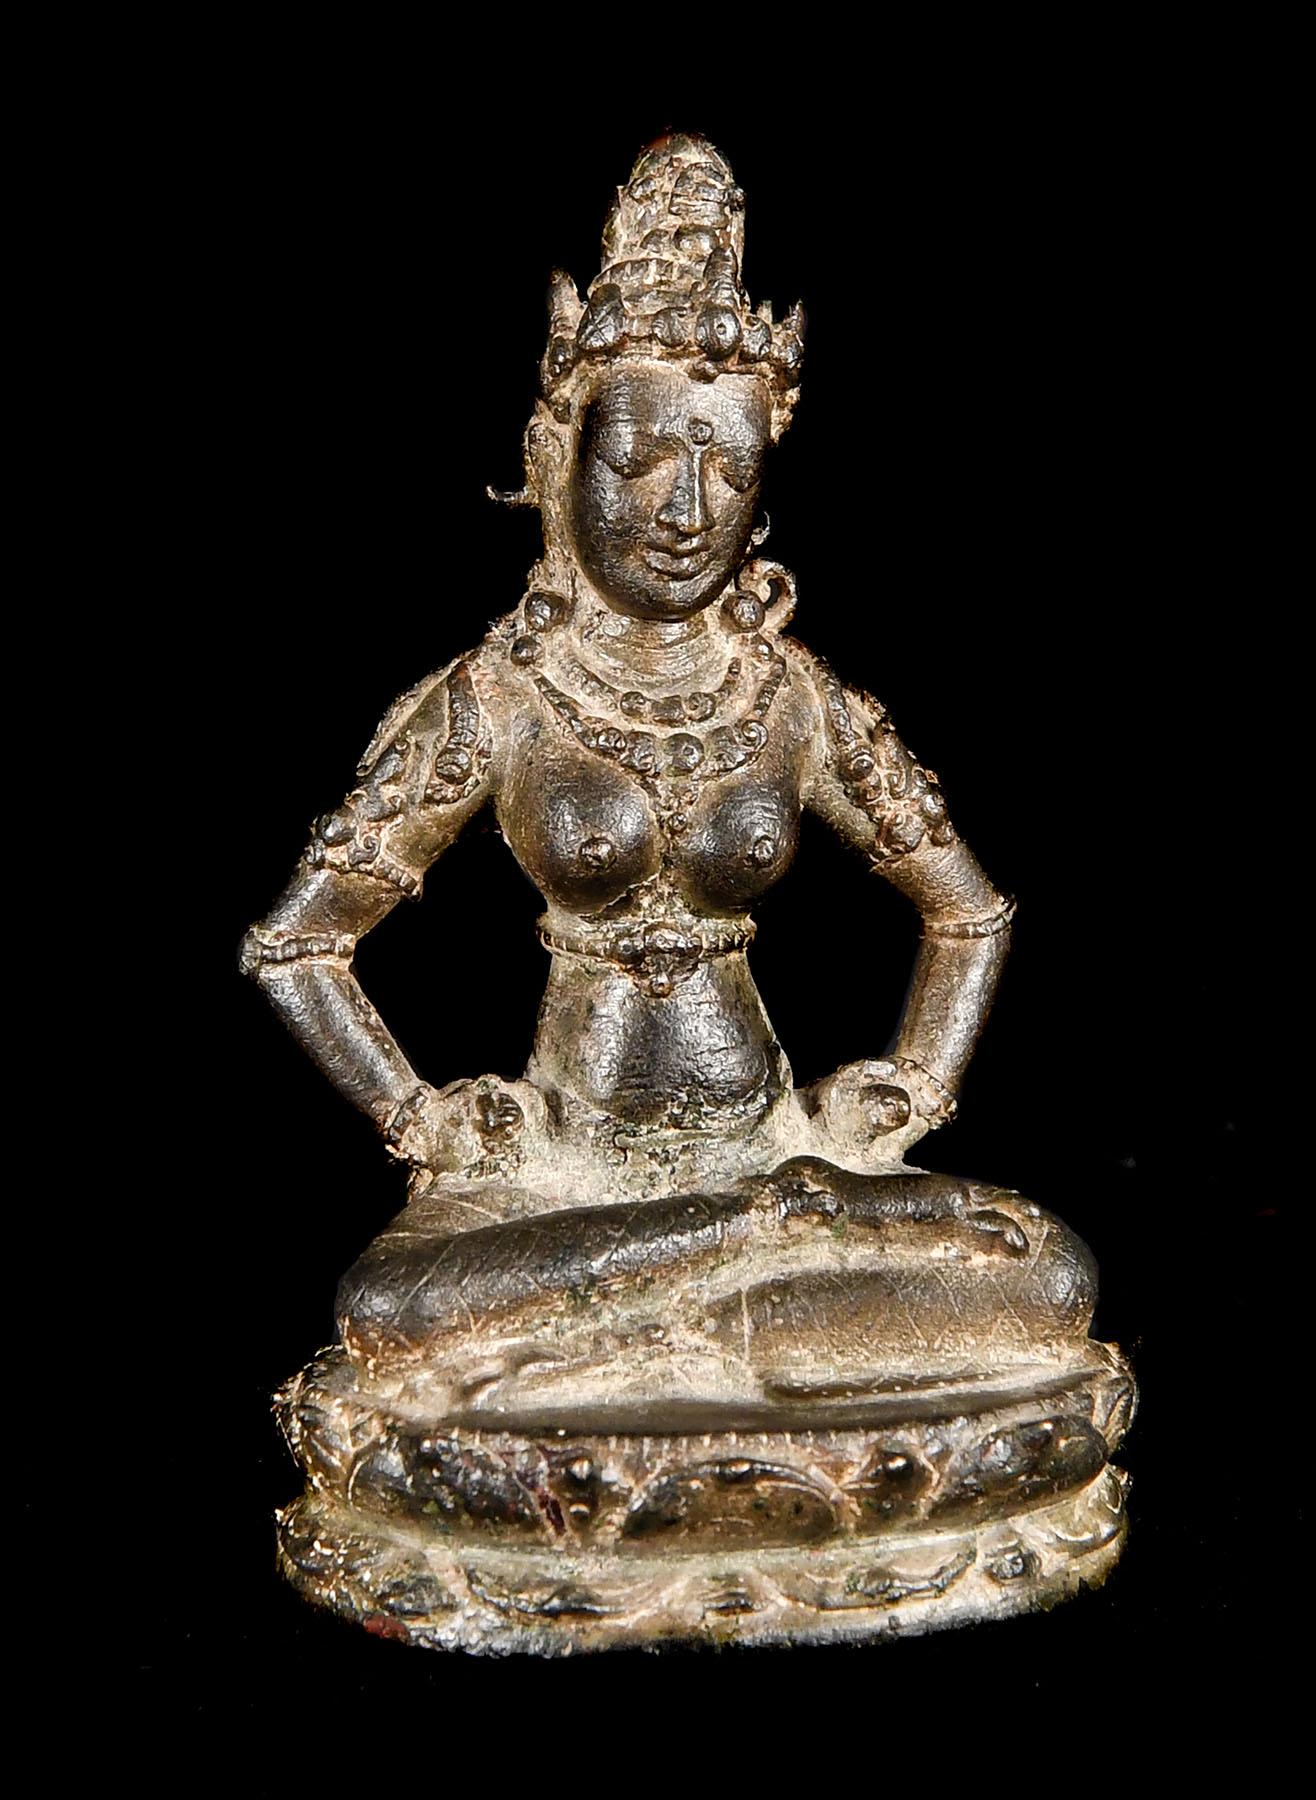 Indonesia, Eastern Javanese period, Ngandjuk, 975-1050 3 5/16 (8.4 cm.) high